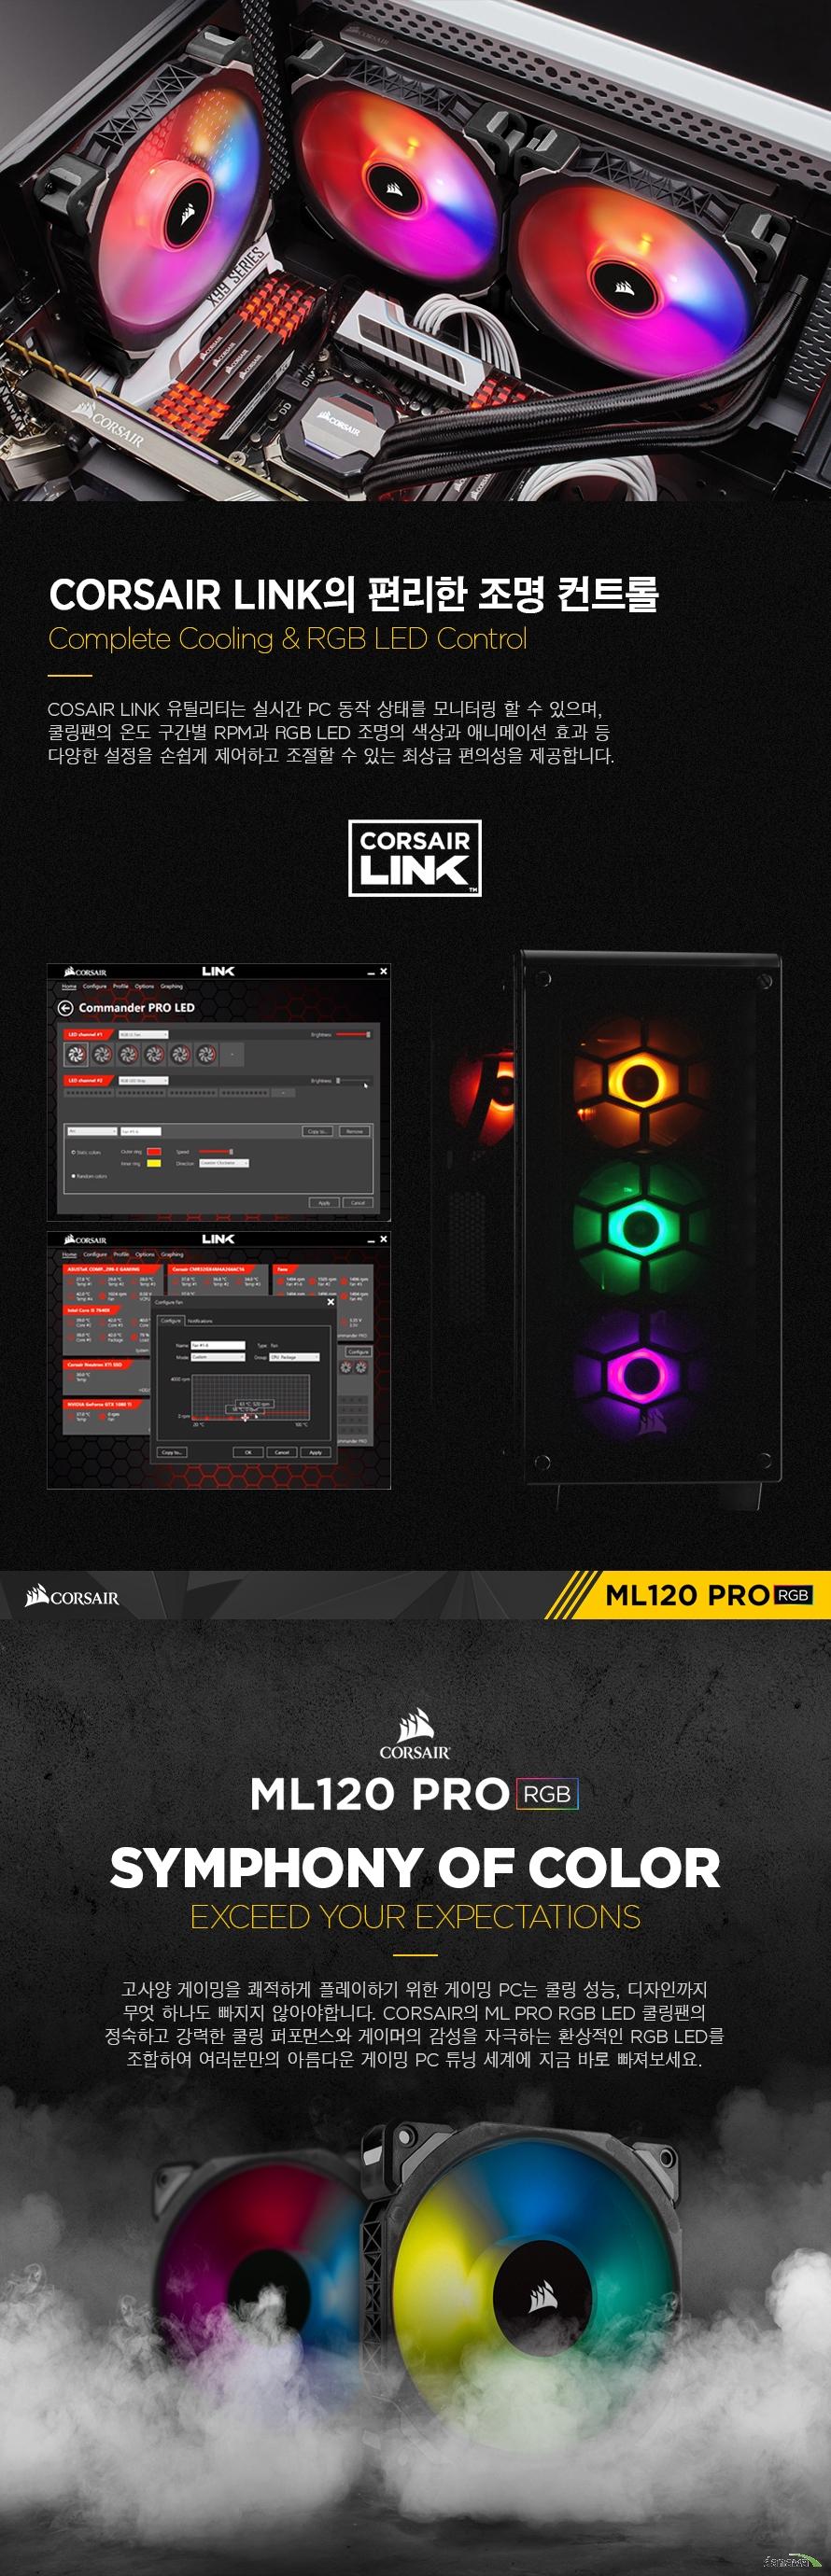 COSAIR LINK 유틸리티는 실시간 PC 동작 상태를 모니터링 할 수 있으며, 쿨링팬의 온도 구간별 RPM과 RGB LED 조명의 색상과 애니메이션 효과 등 다양한 설정을 손쉽게 제어하고 조절할 수 있는 최상급 편의성을 제공합니다.